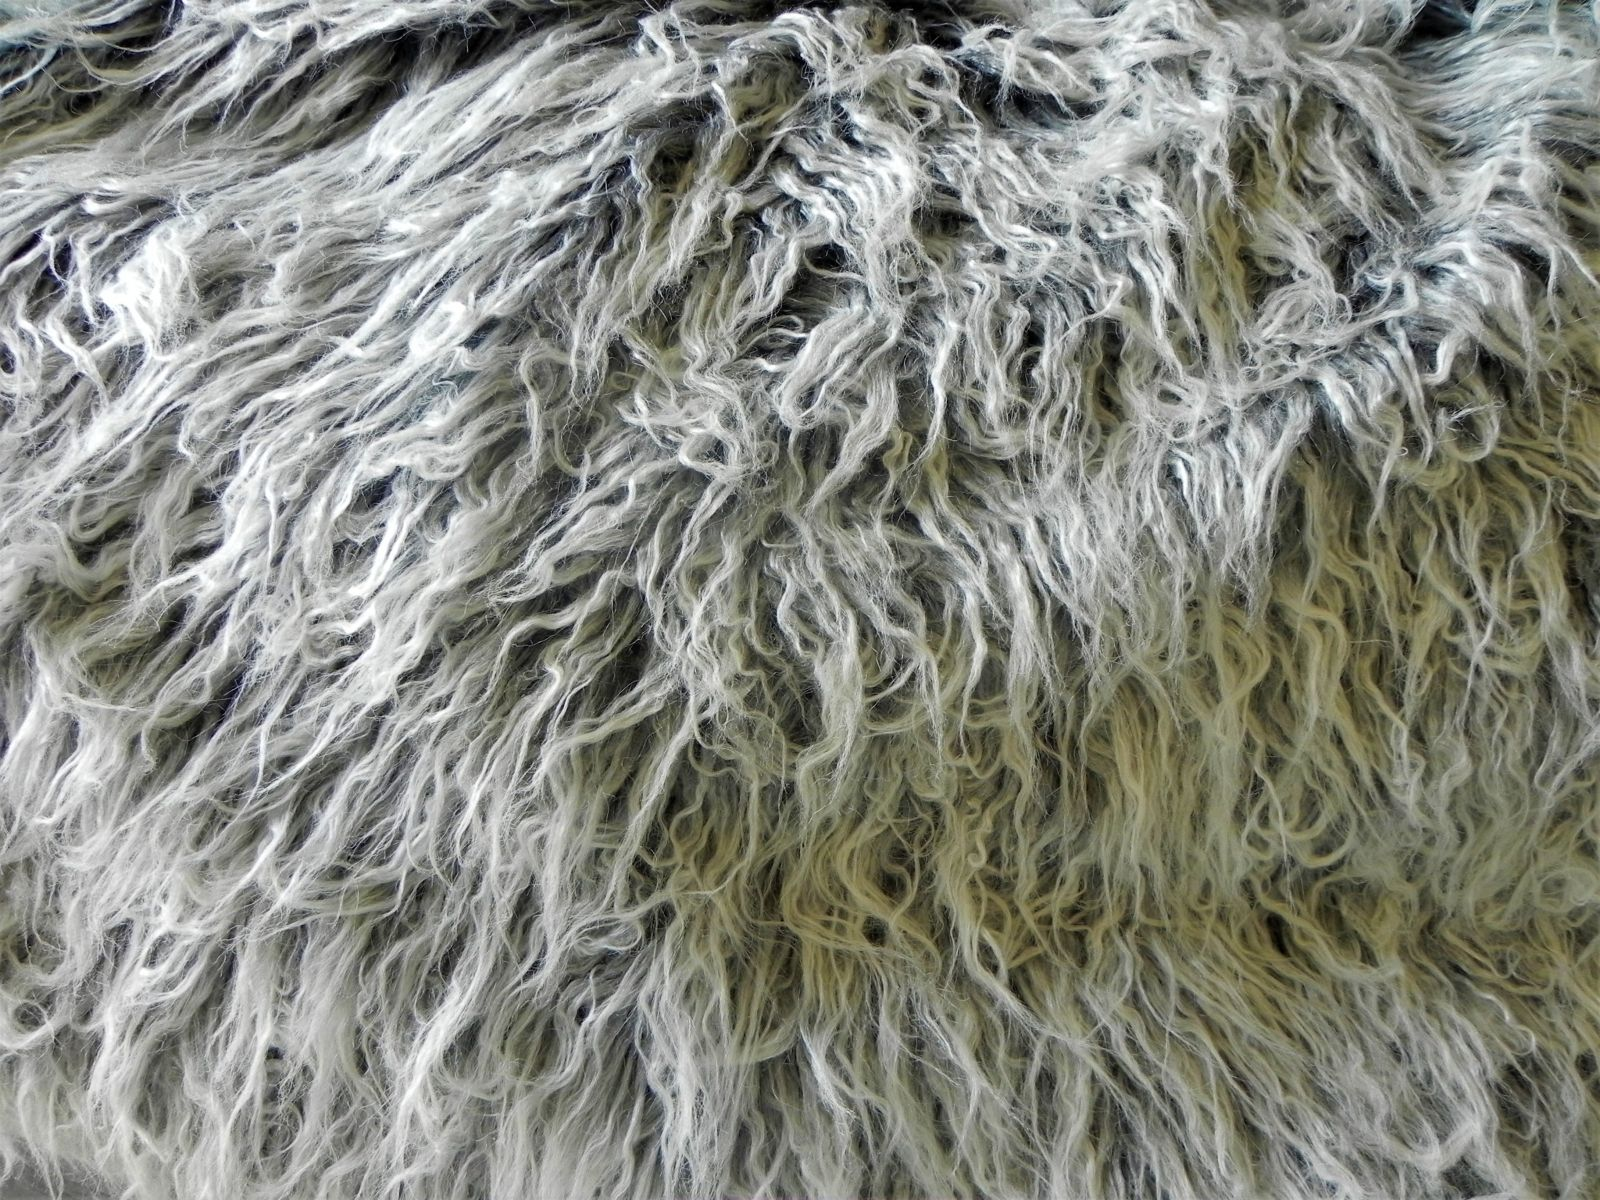 Umělá kožešina, metráž, šedo bílá, LAMA, 70mm vlas, š. 147cm